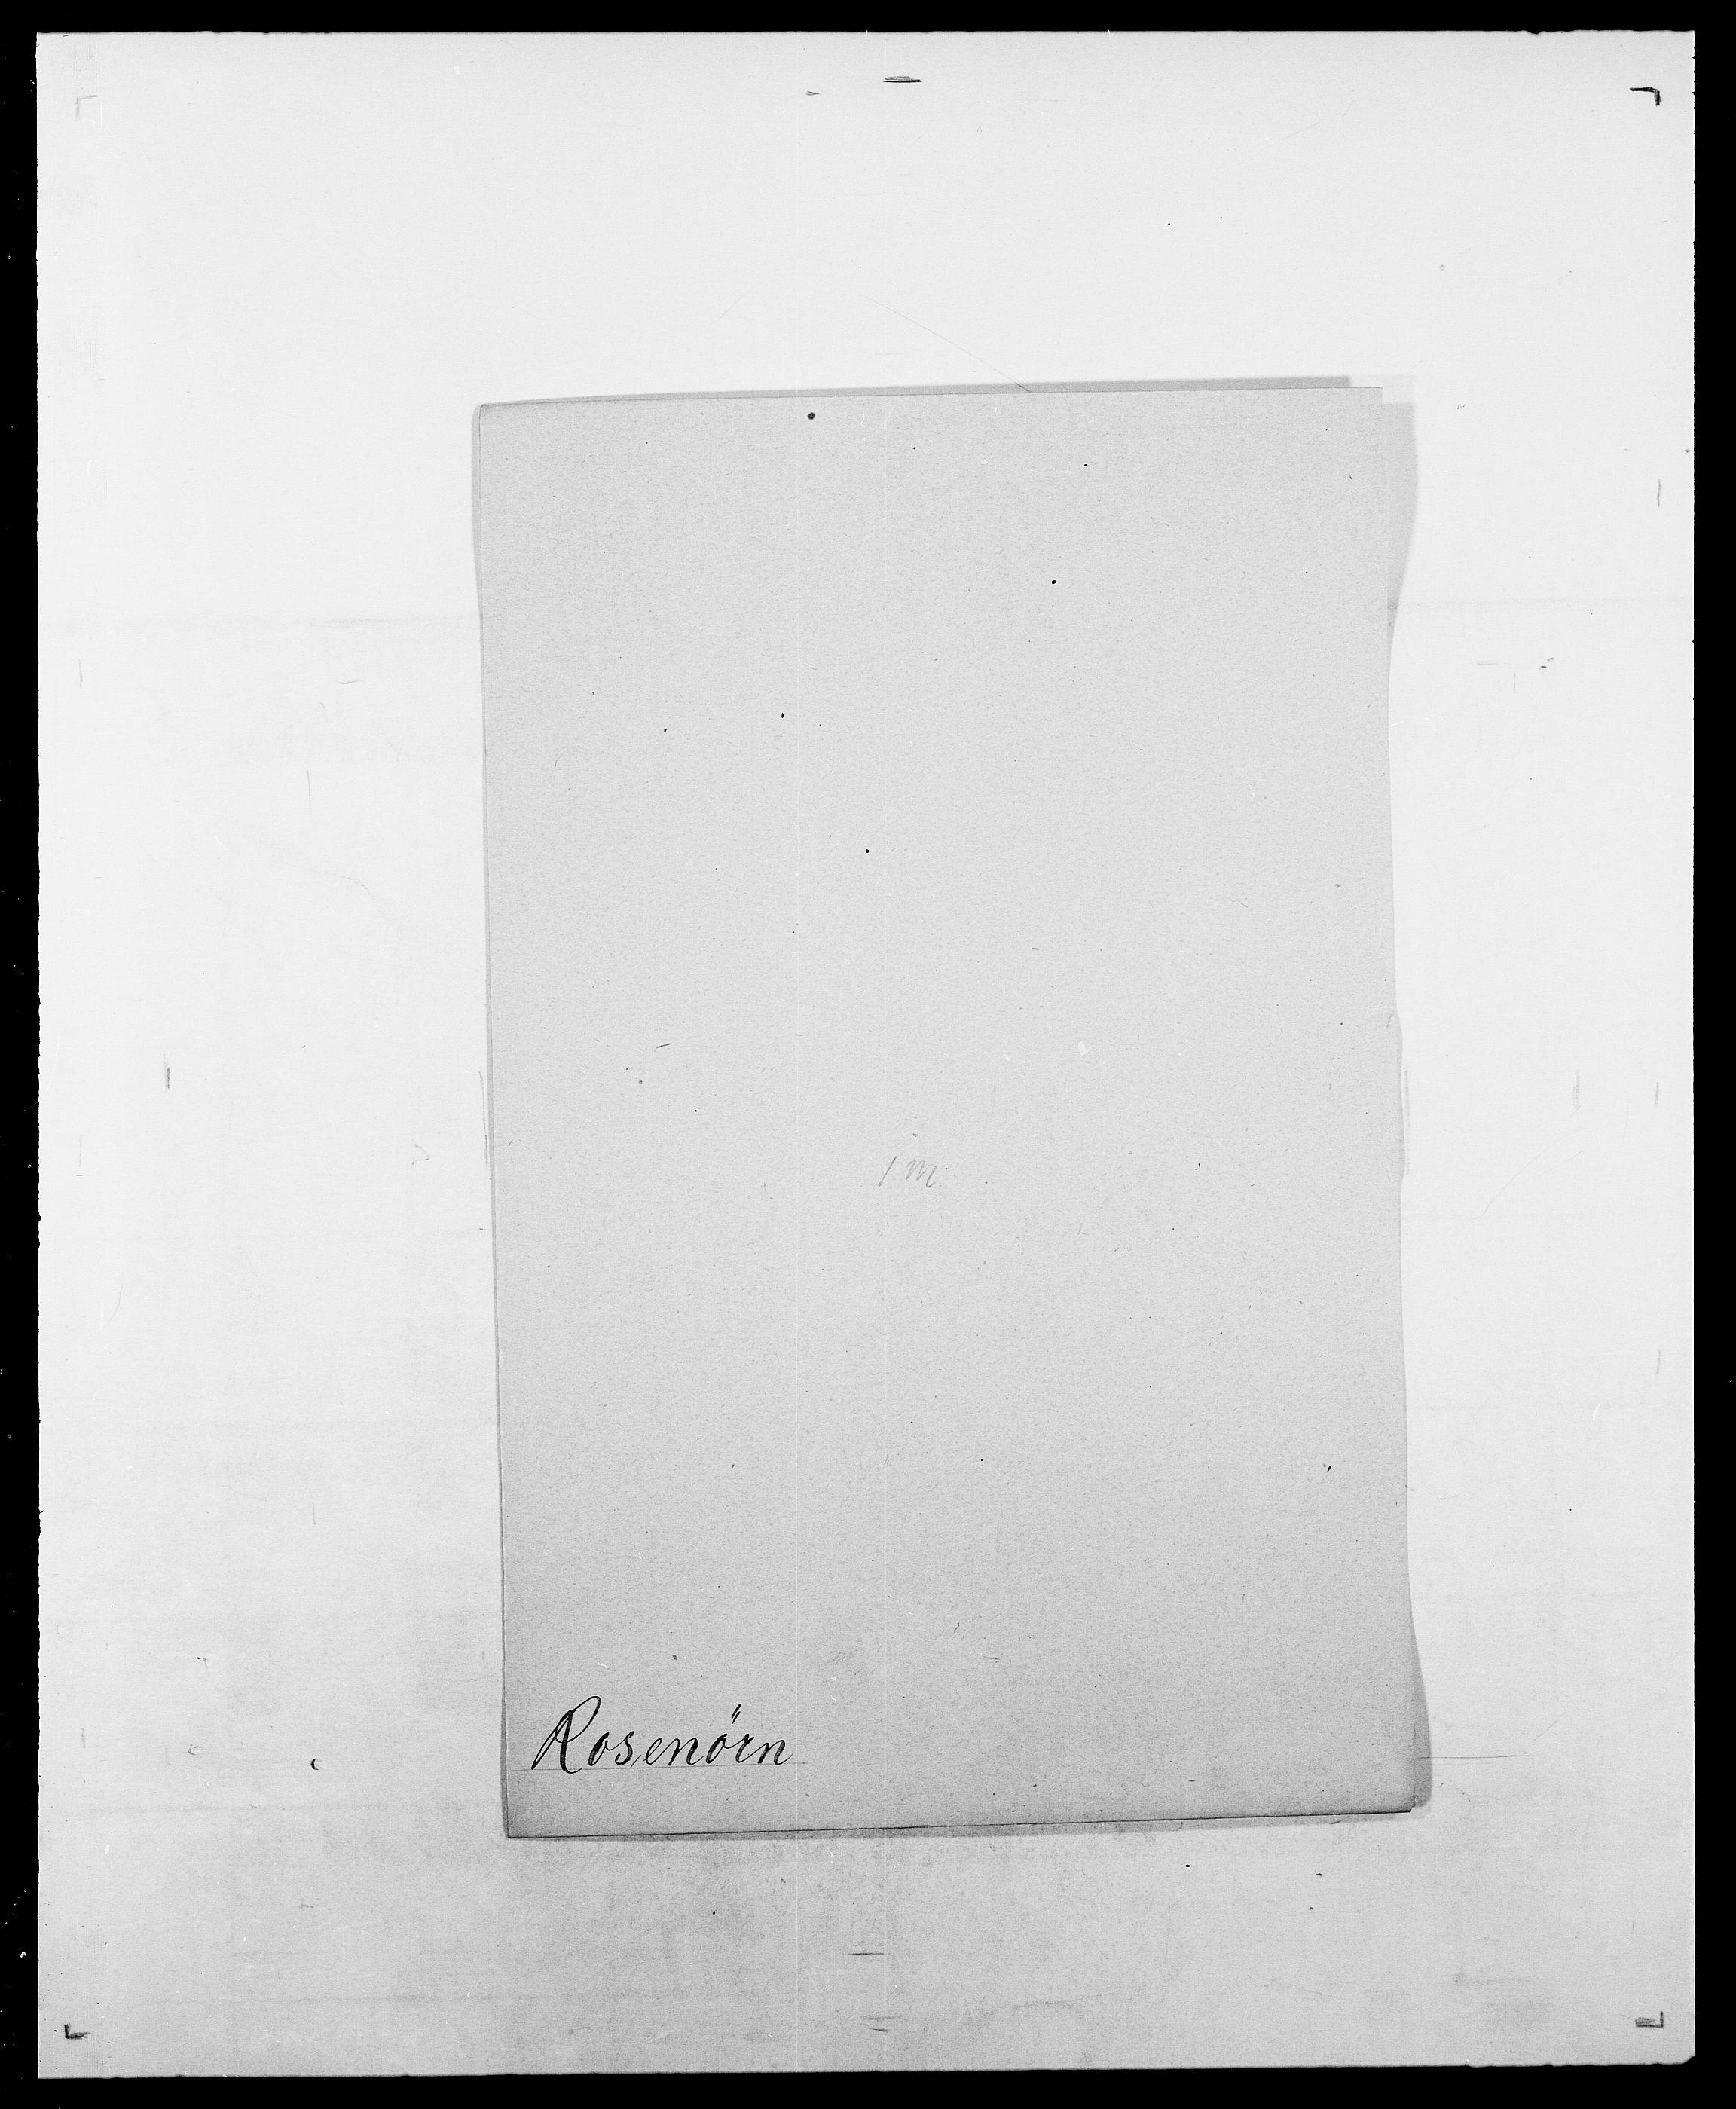 SAO, Delgobe, Charles Antoine - samling, D/Da/L0033: Roald - Røyem, s. 304